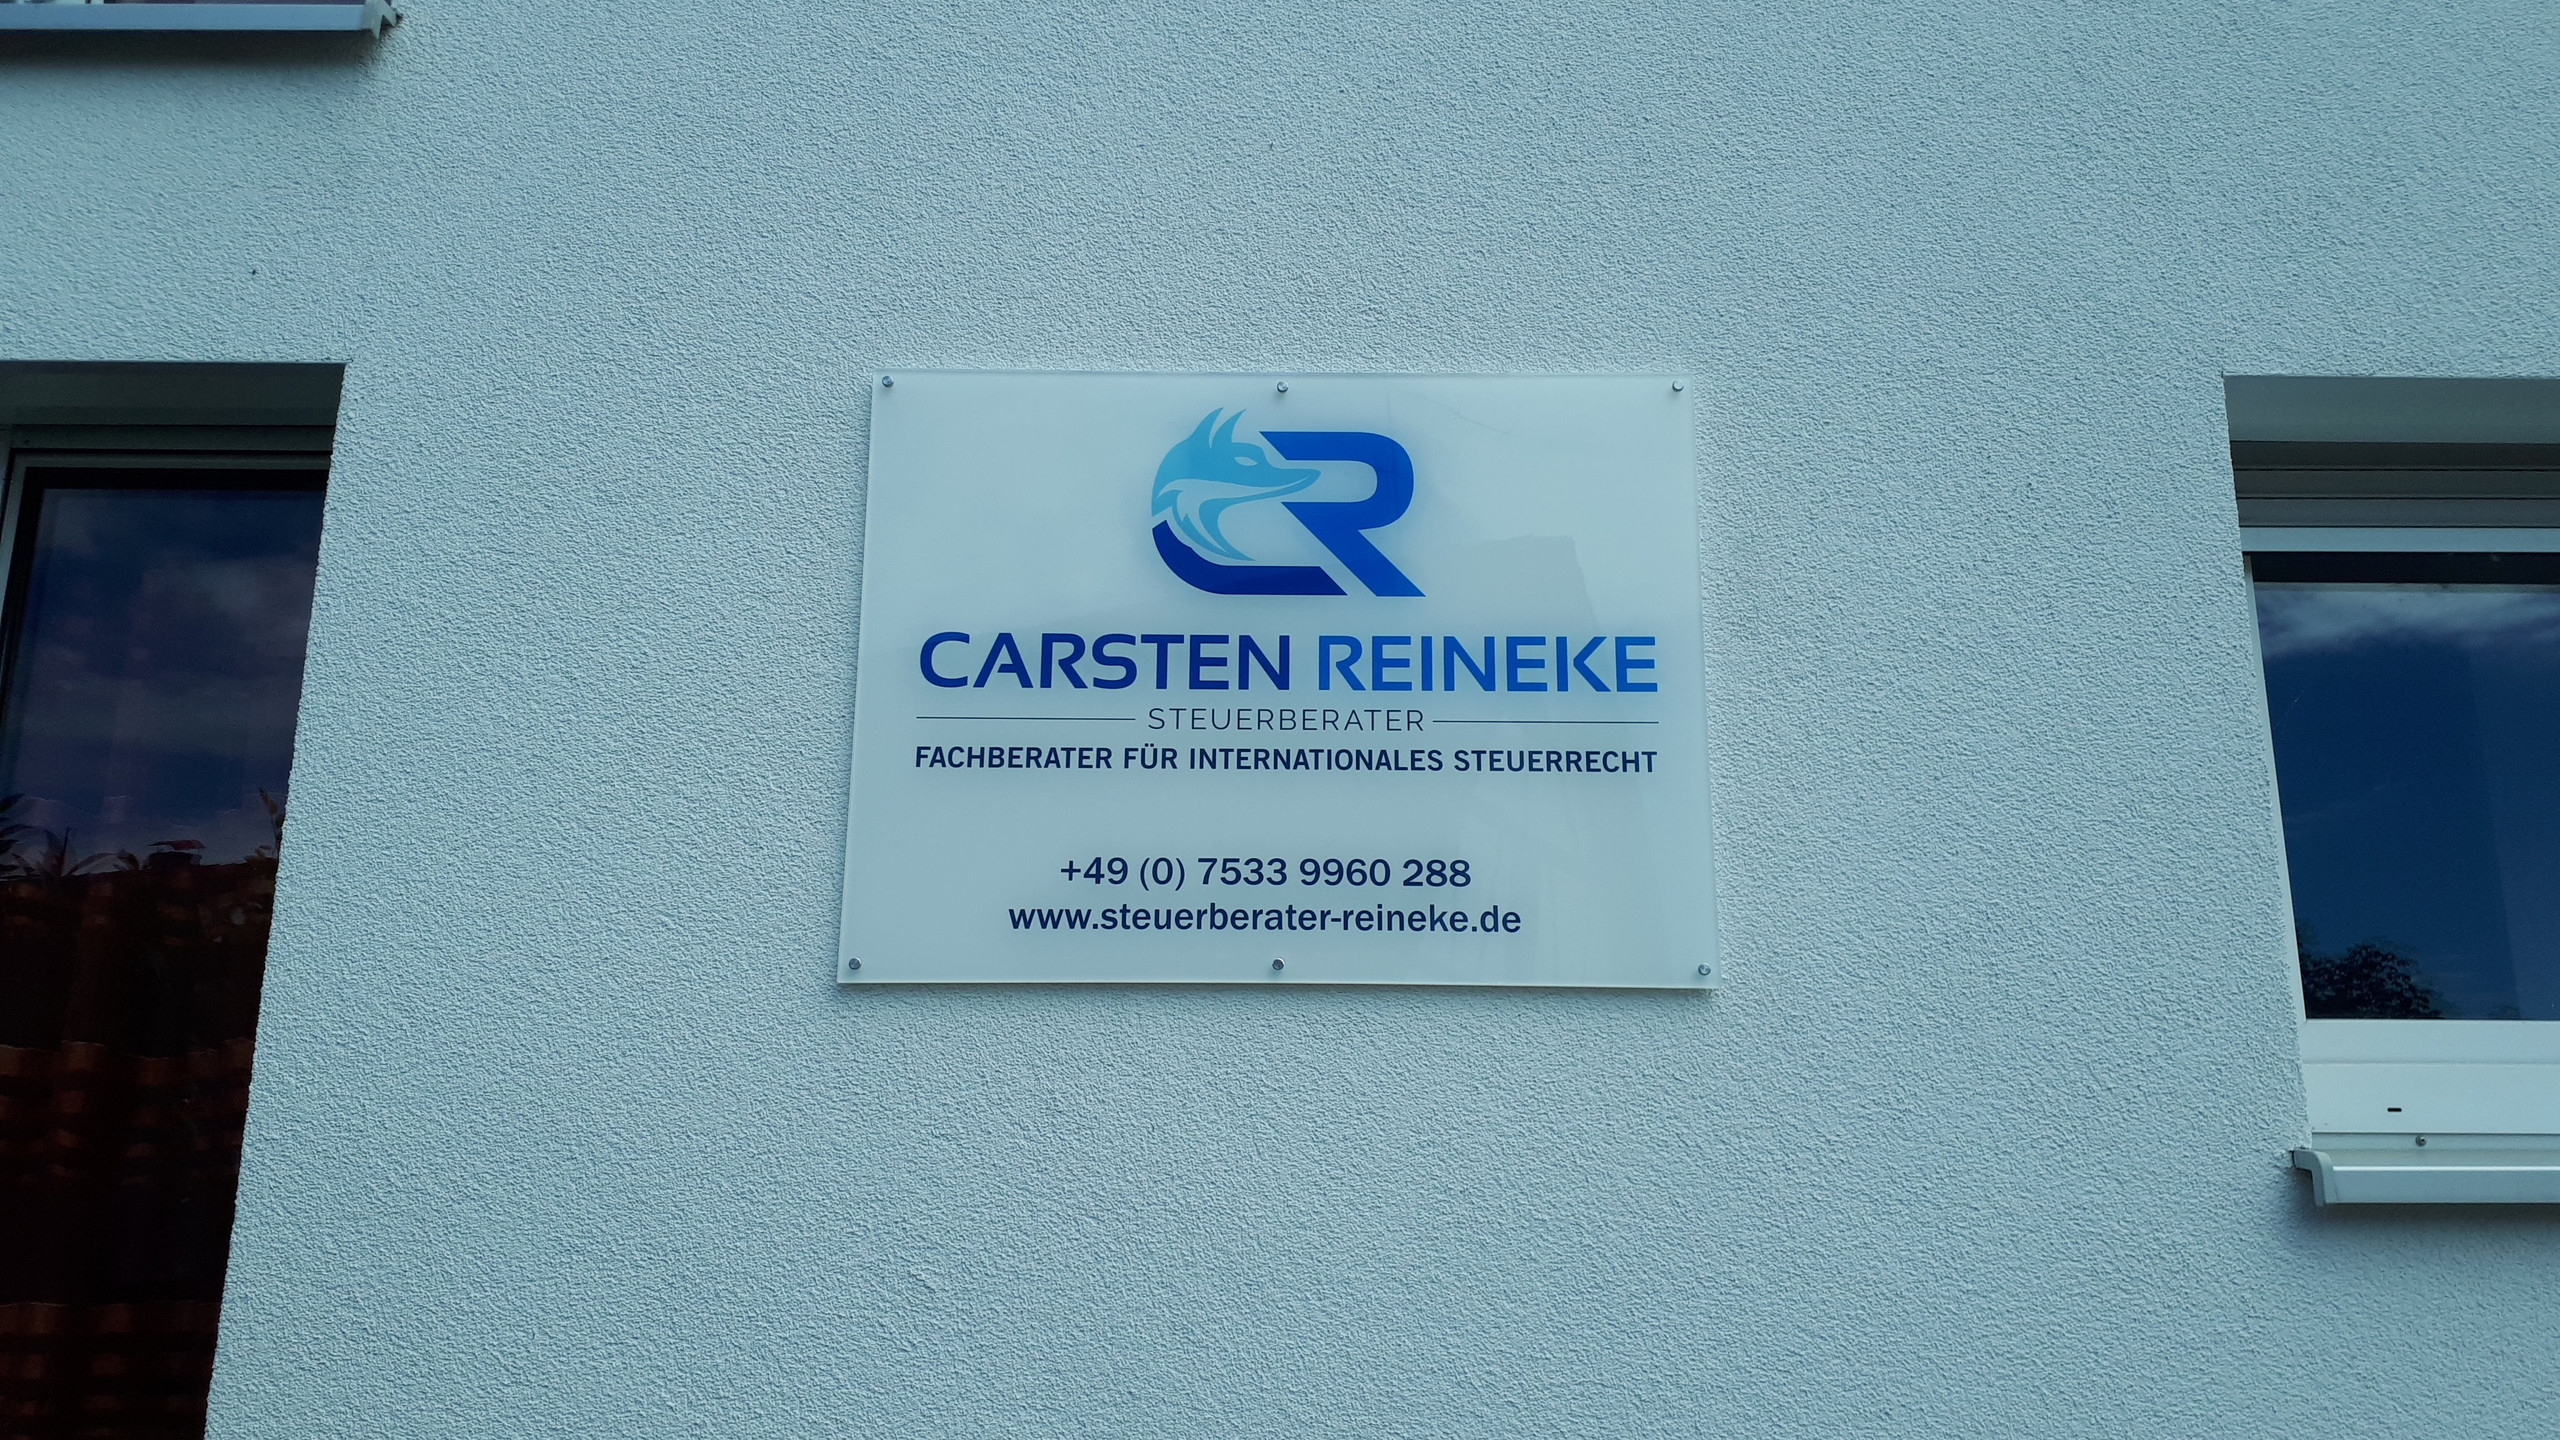 Firmenschild / company sign